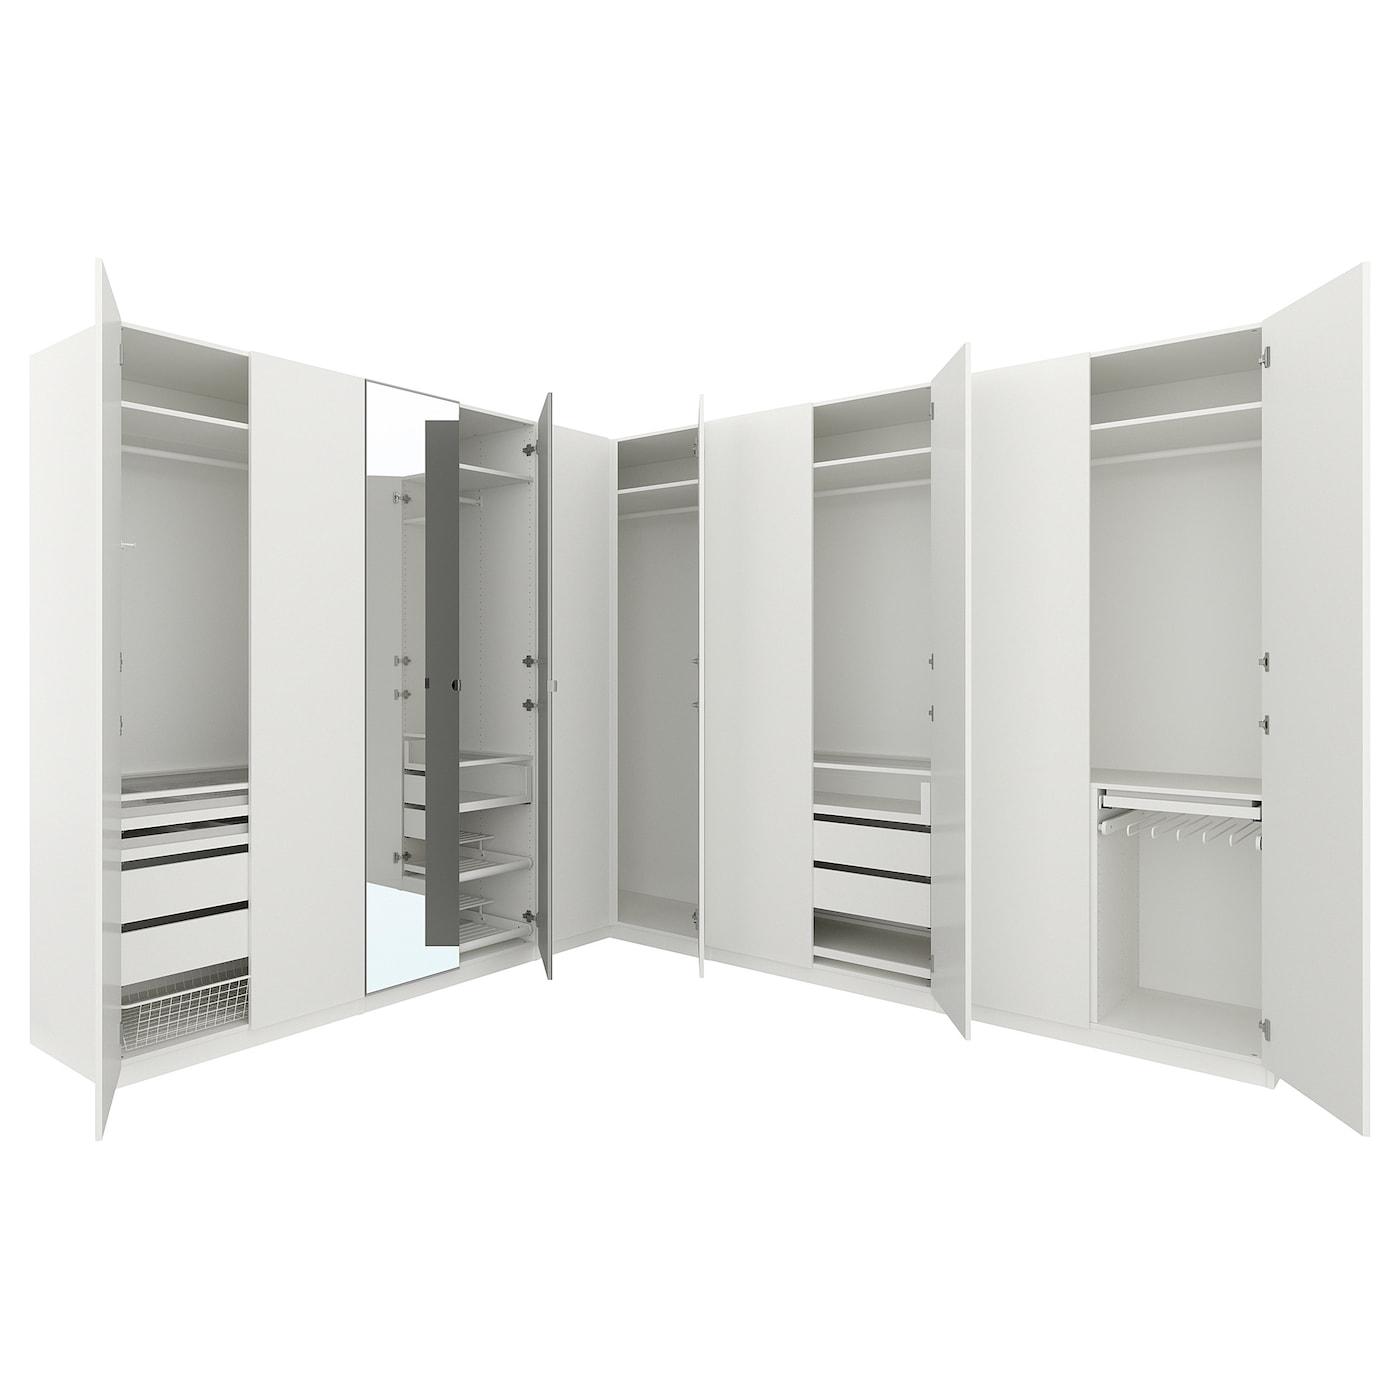 Pax armario esquina blanco forsand vikedal 310 310 x 236 cm ikea - Ikea armarios modulares ...